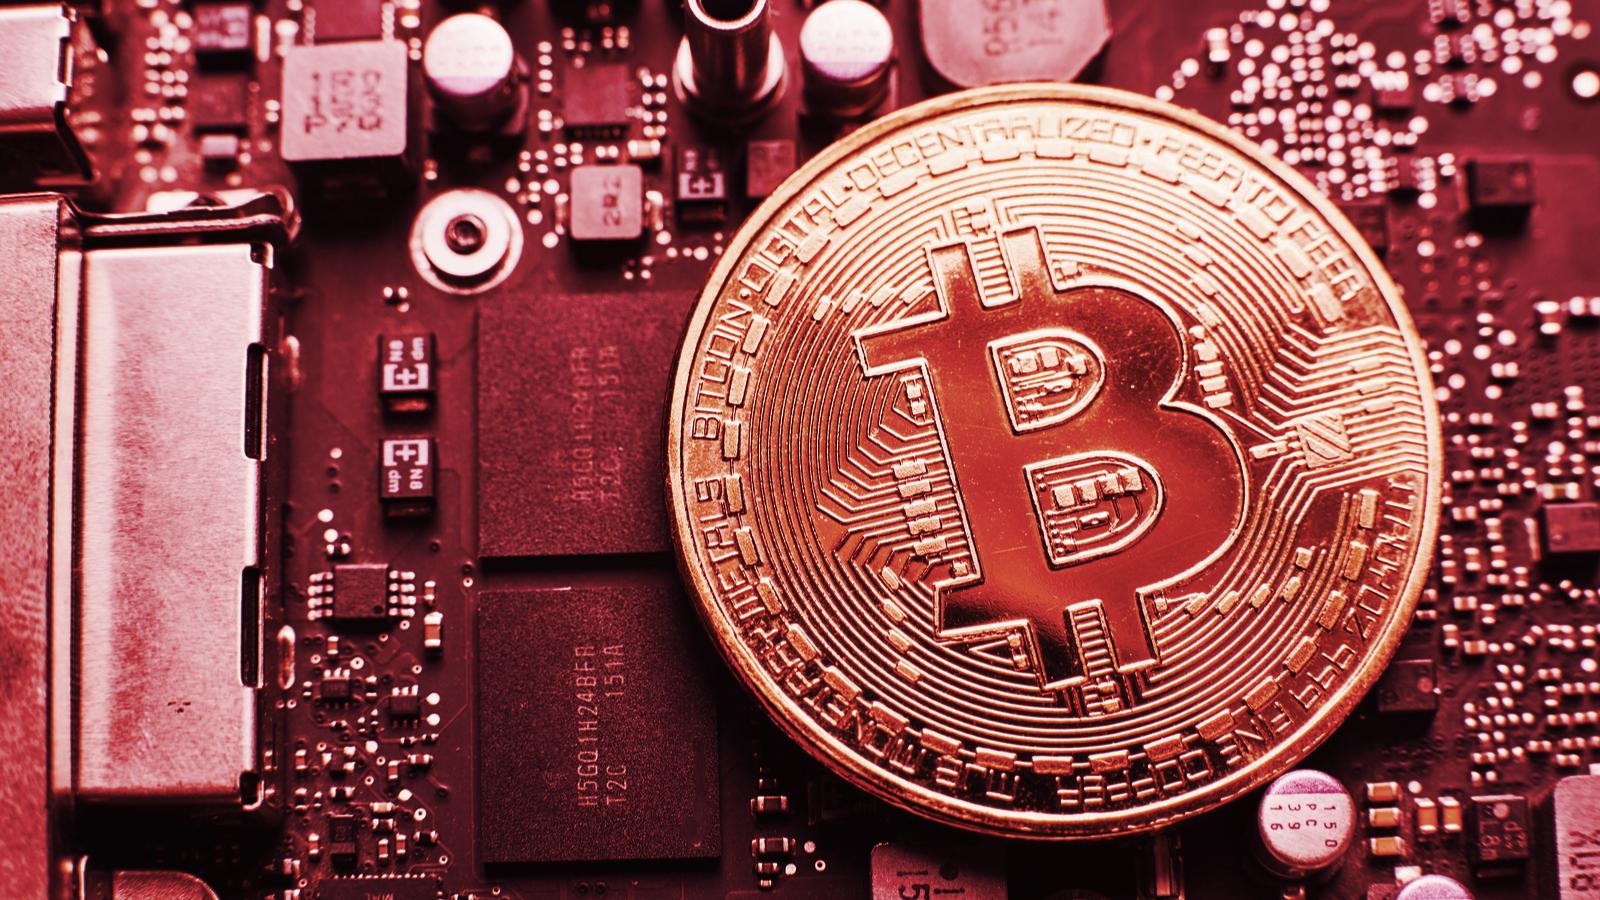 Bitmain Suspends Sales of Bitcoin Mining Machine Amid China Crackdown